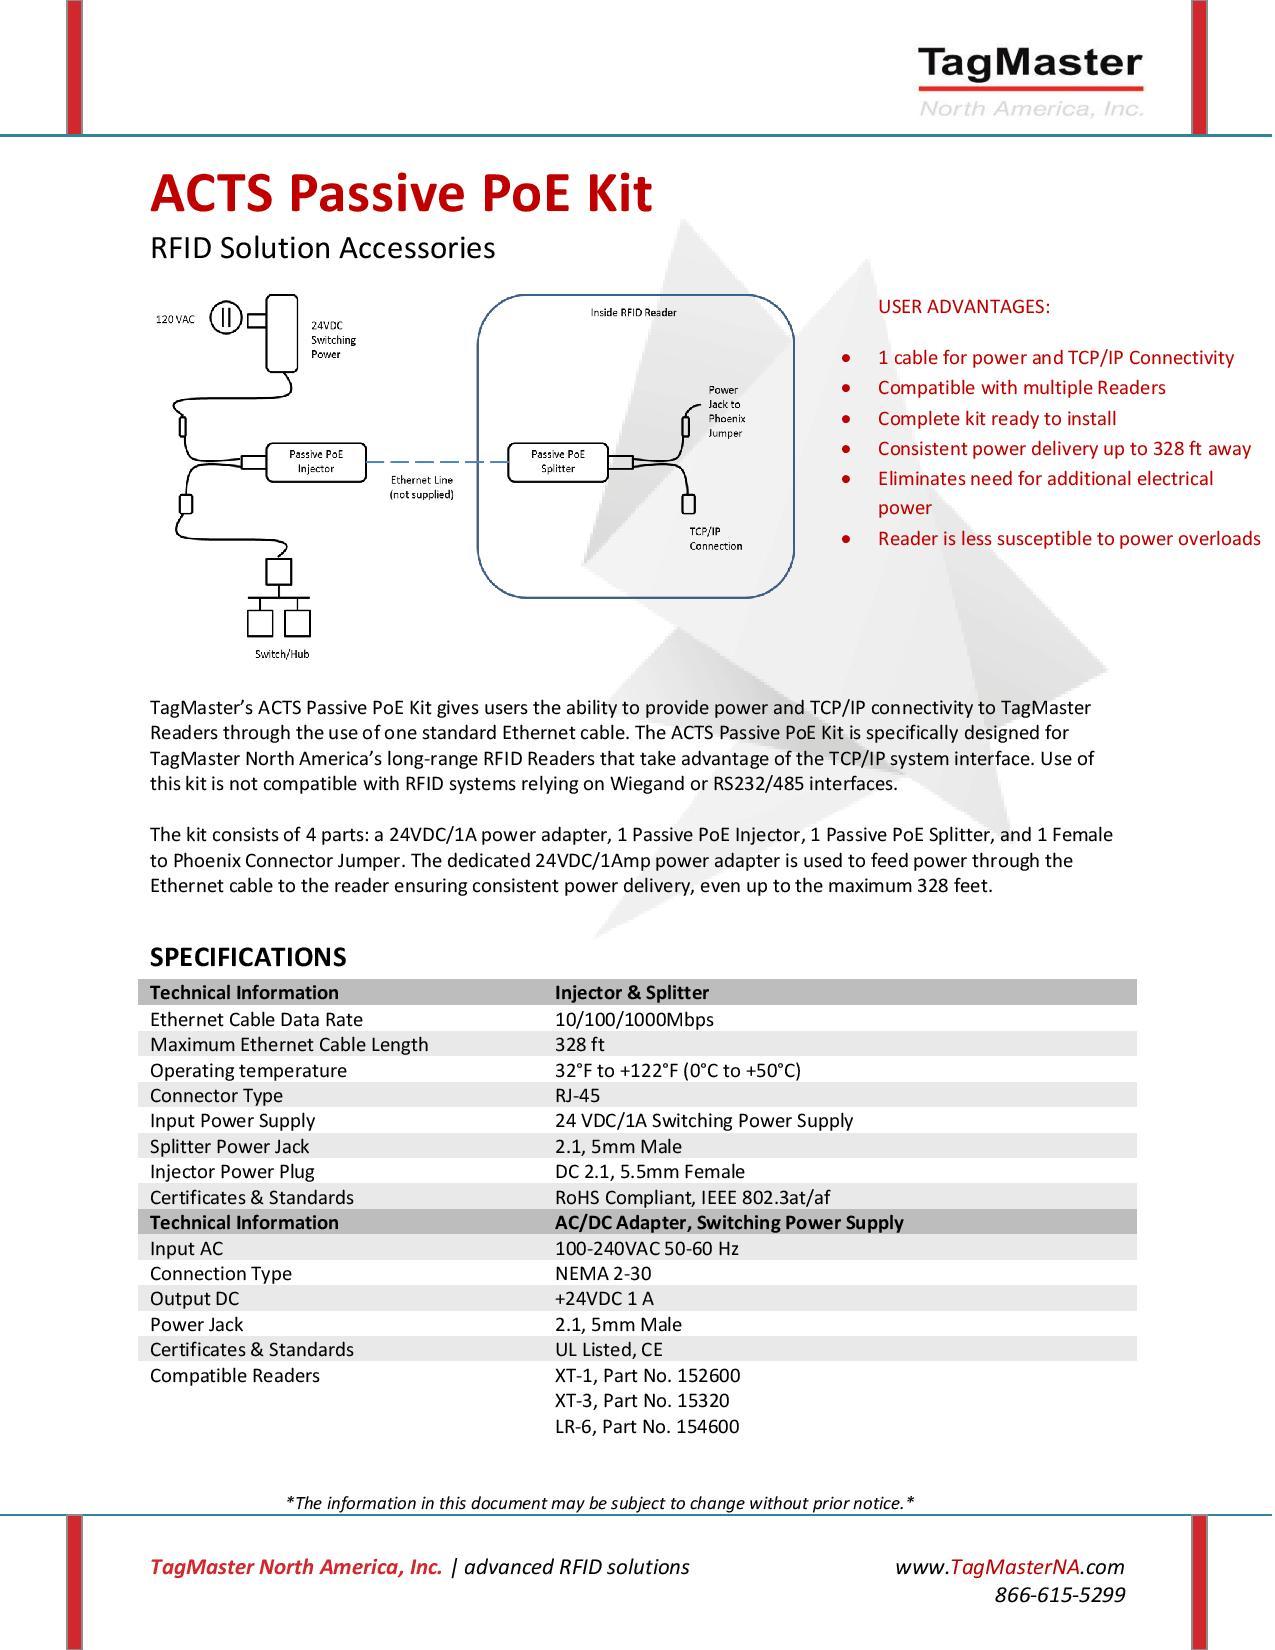 PS_NA2500_PoE_Kit-page-001